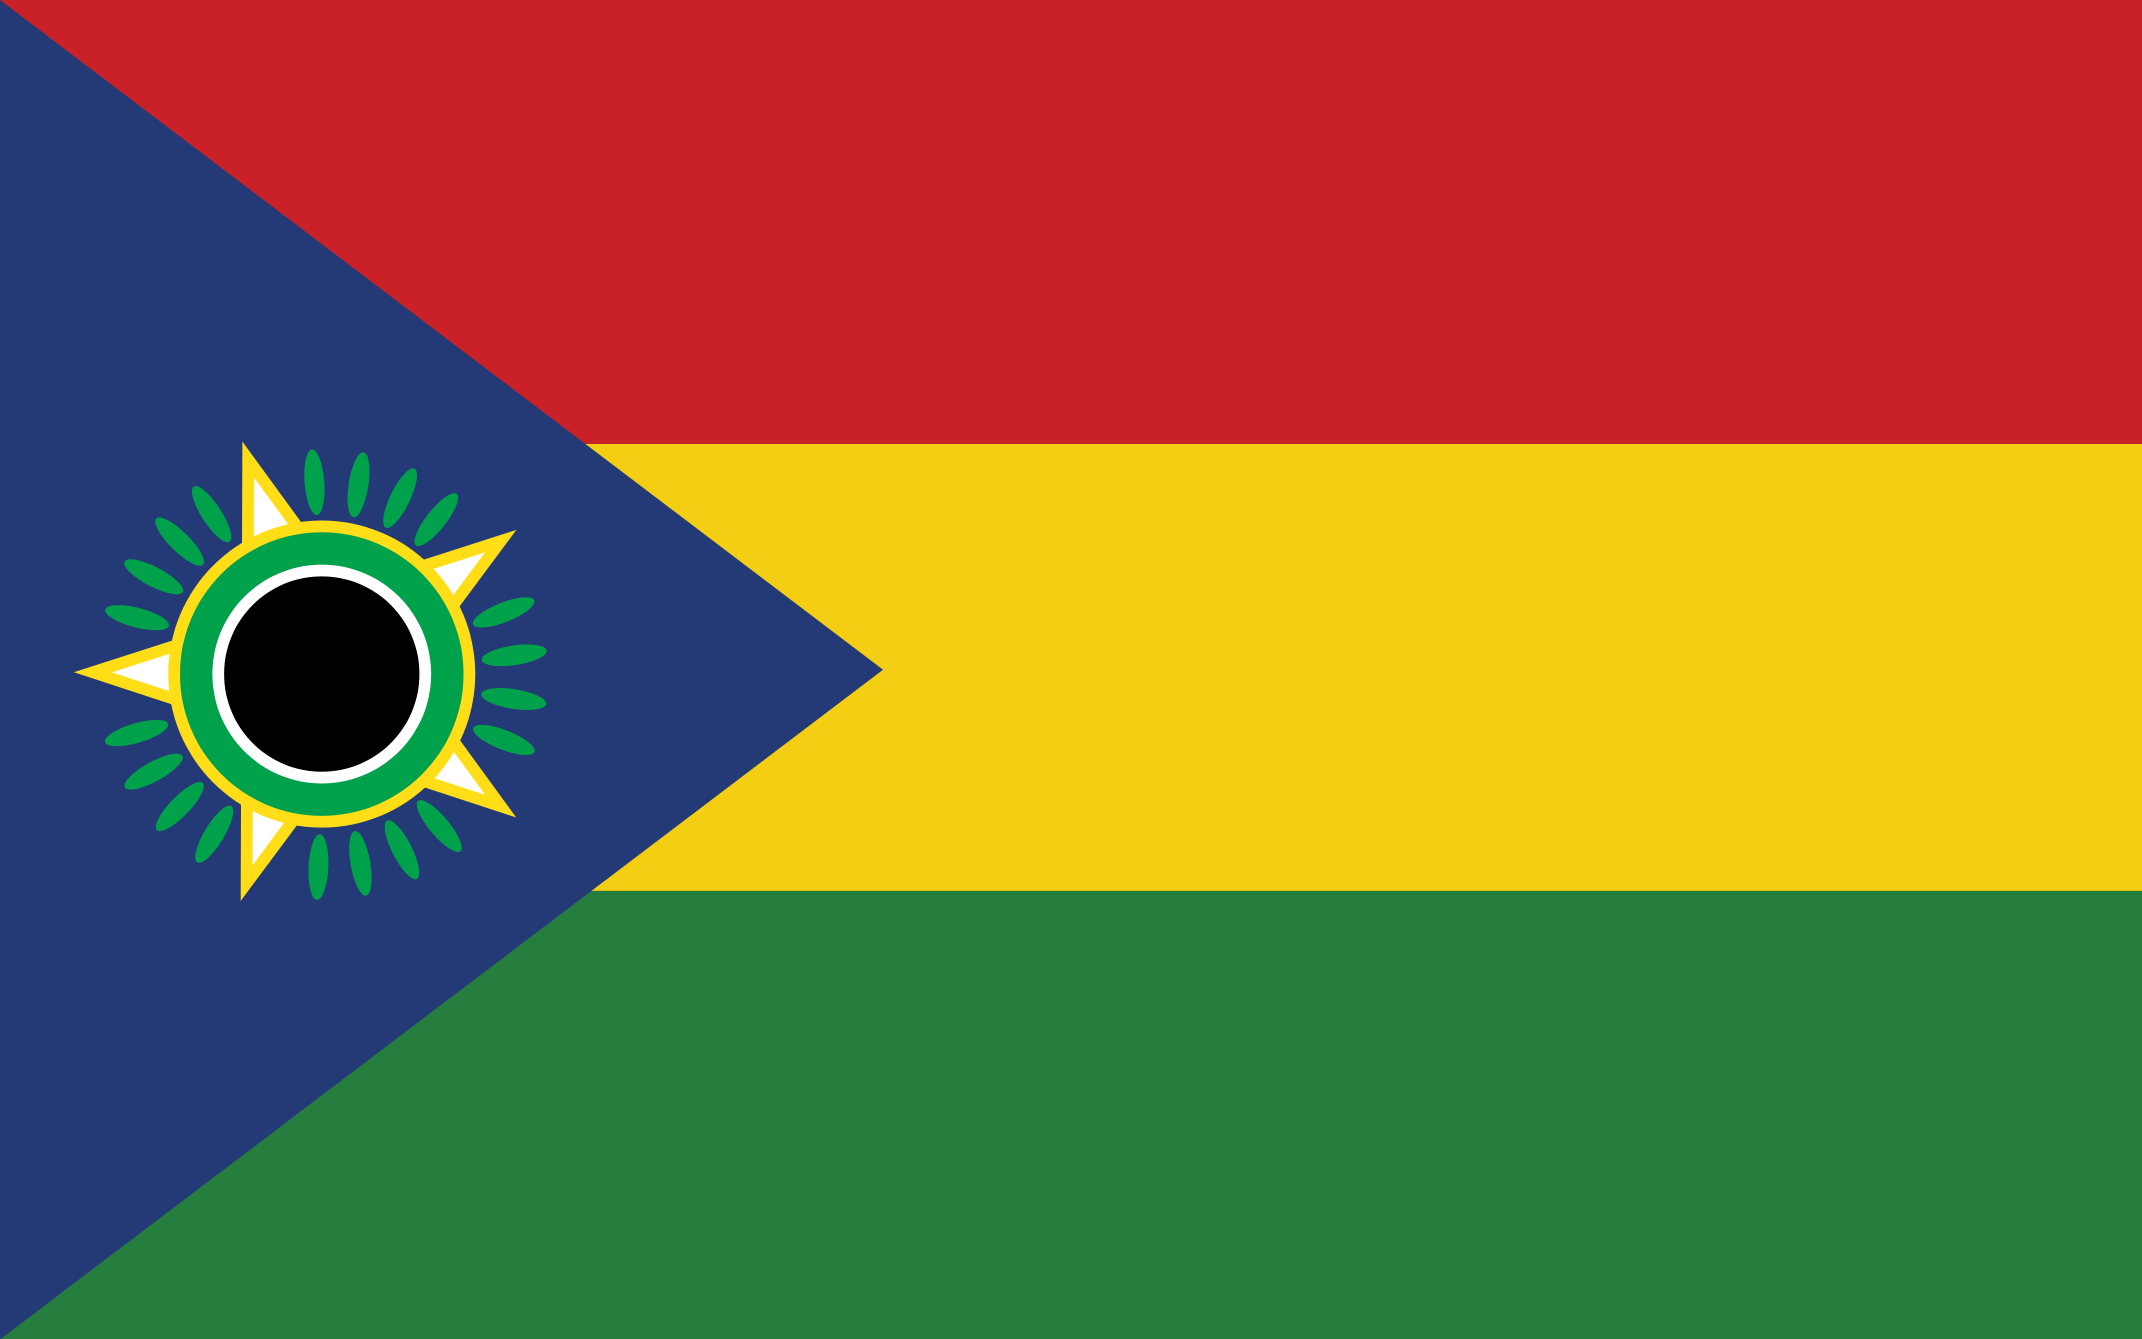 Republic of Tropico (Tropico 3 and 4)